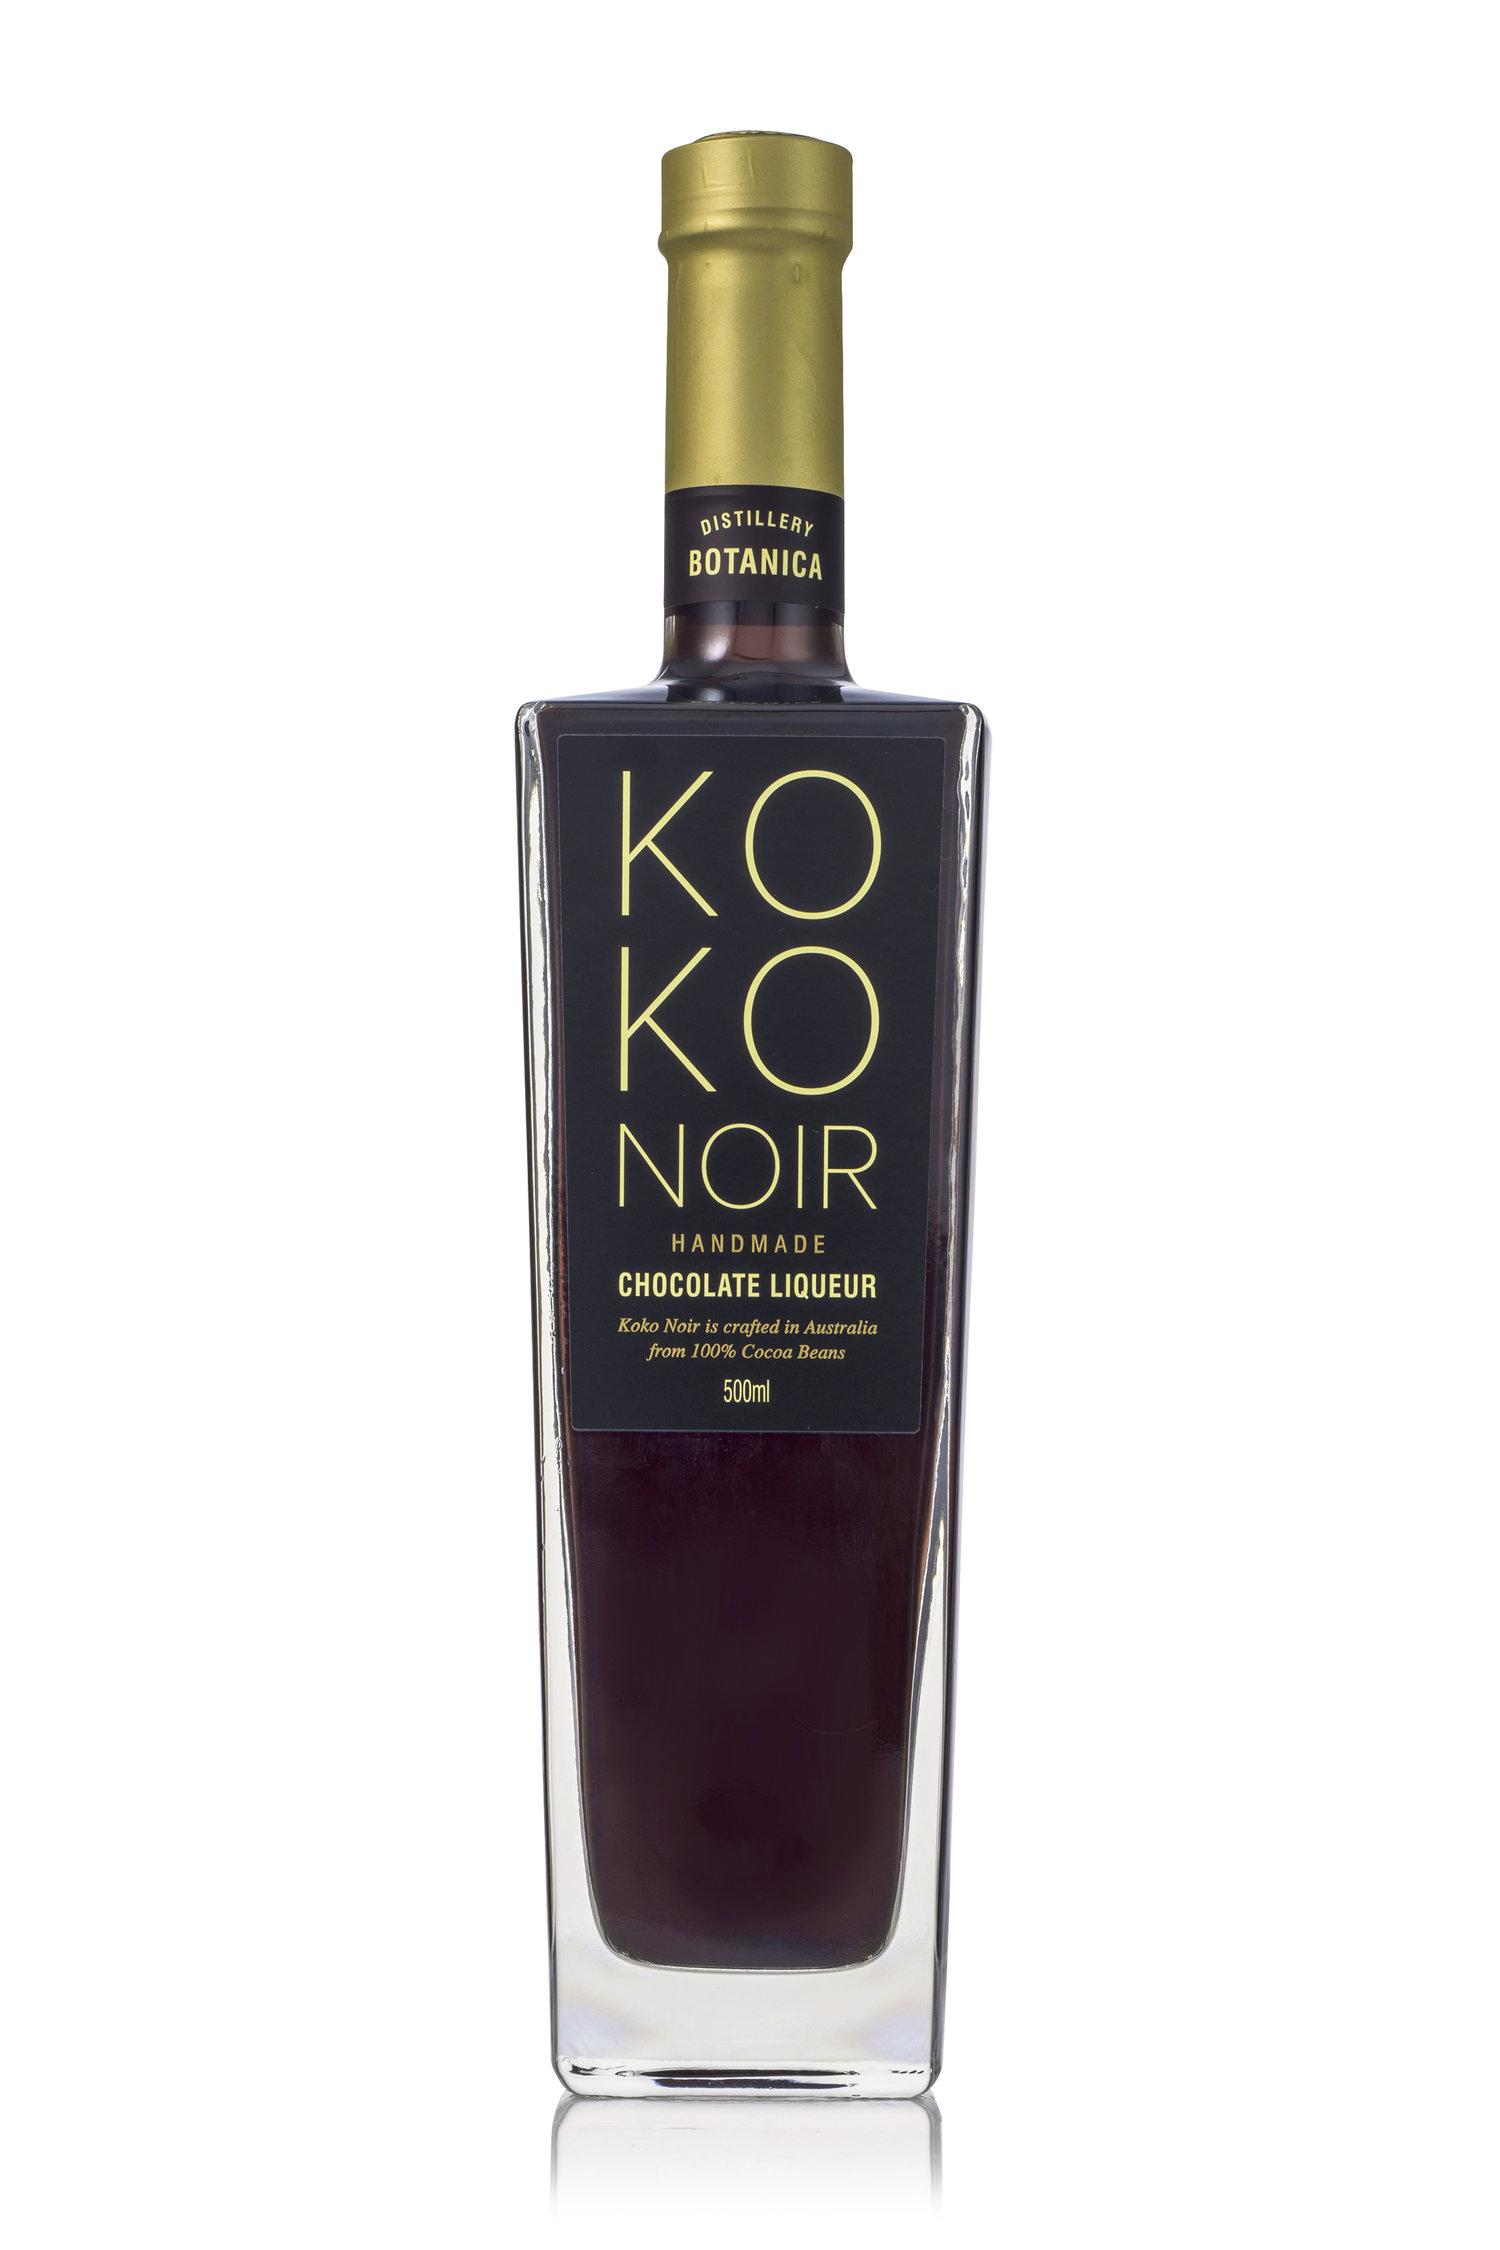 Koko Noir Chocolate Liqueur 500ml — Distillery Botanica